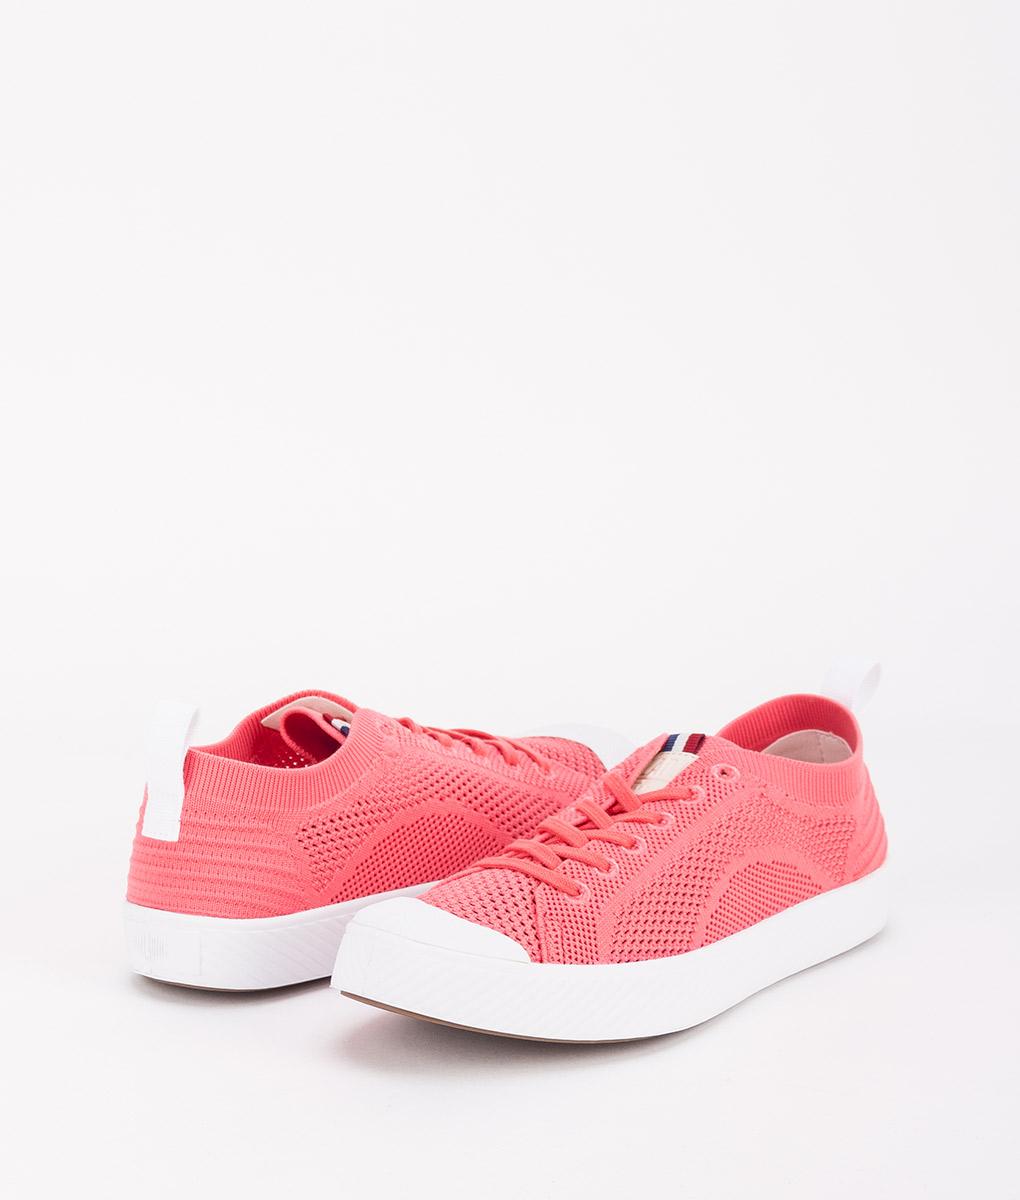 PALLADIUM Women Sneakers 75728 PALLAPHOENIX K, Spiced Coral 94.99